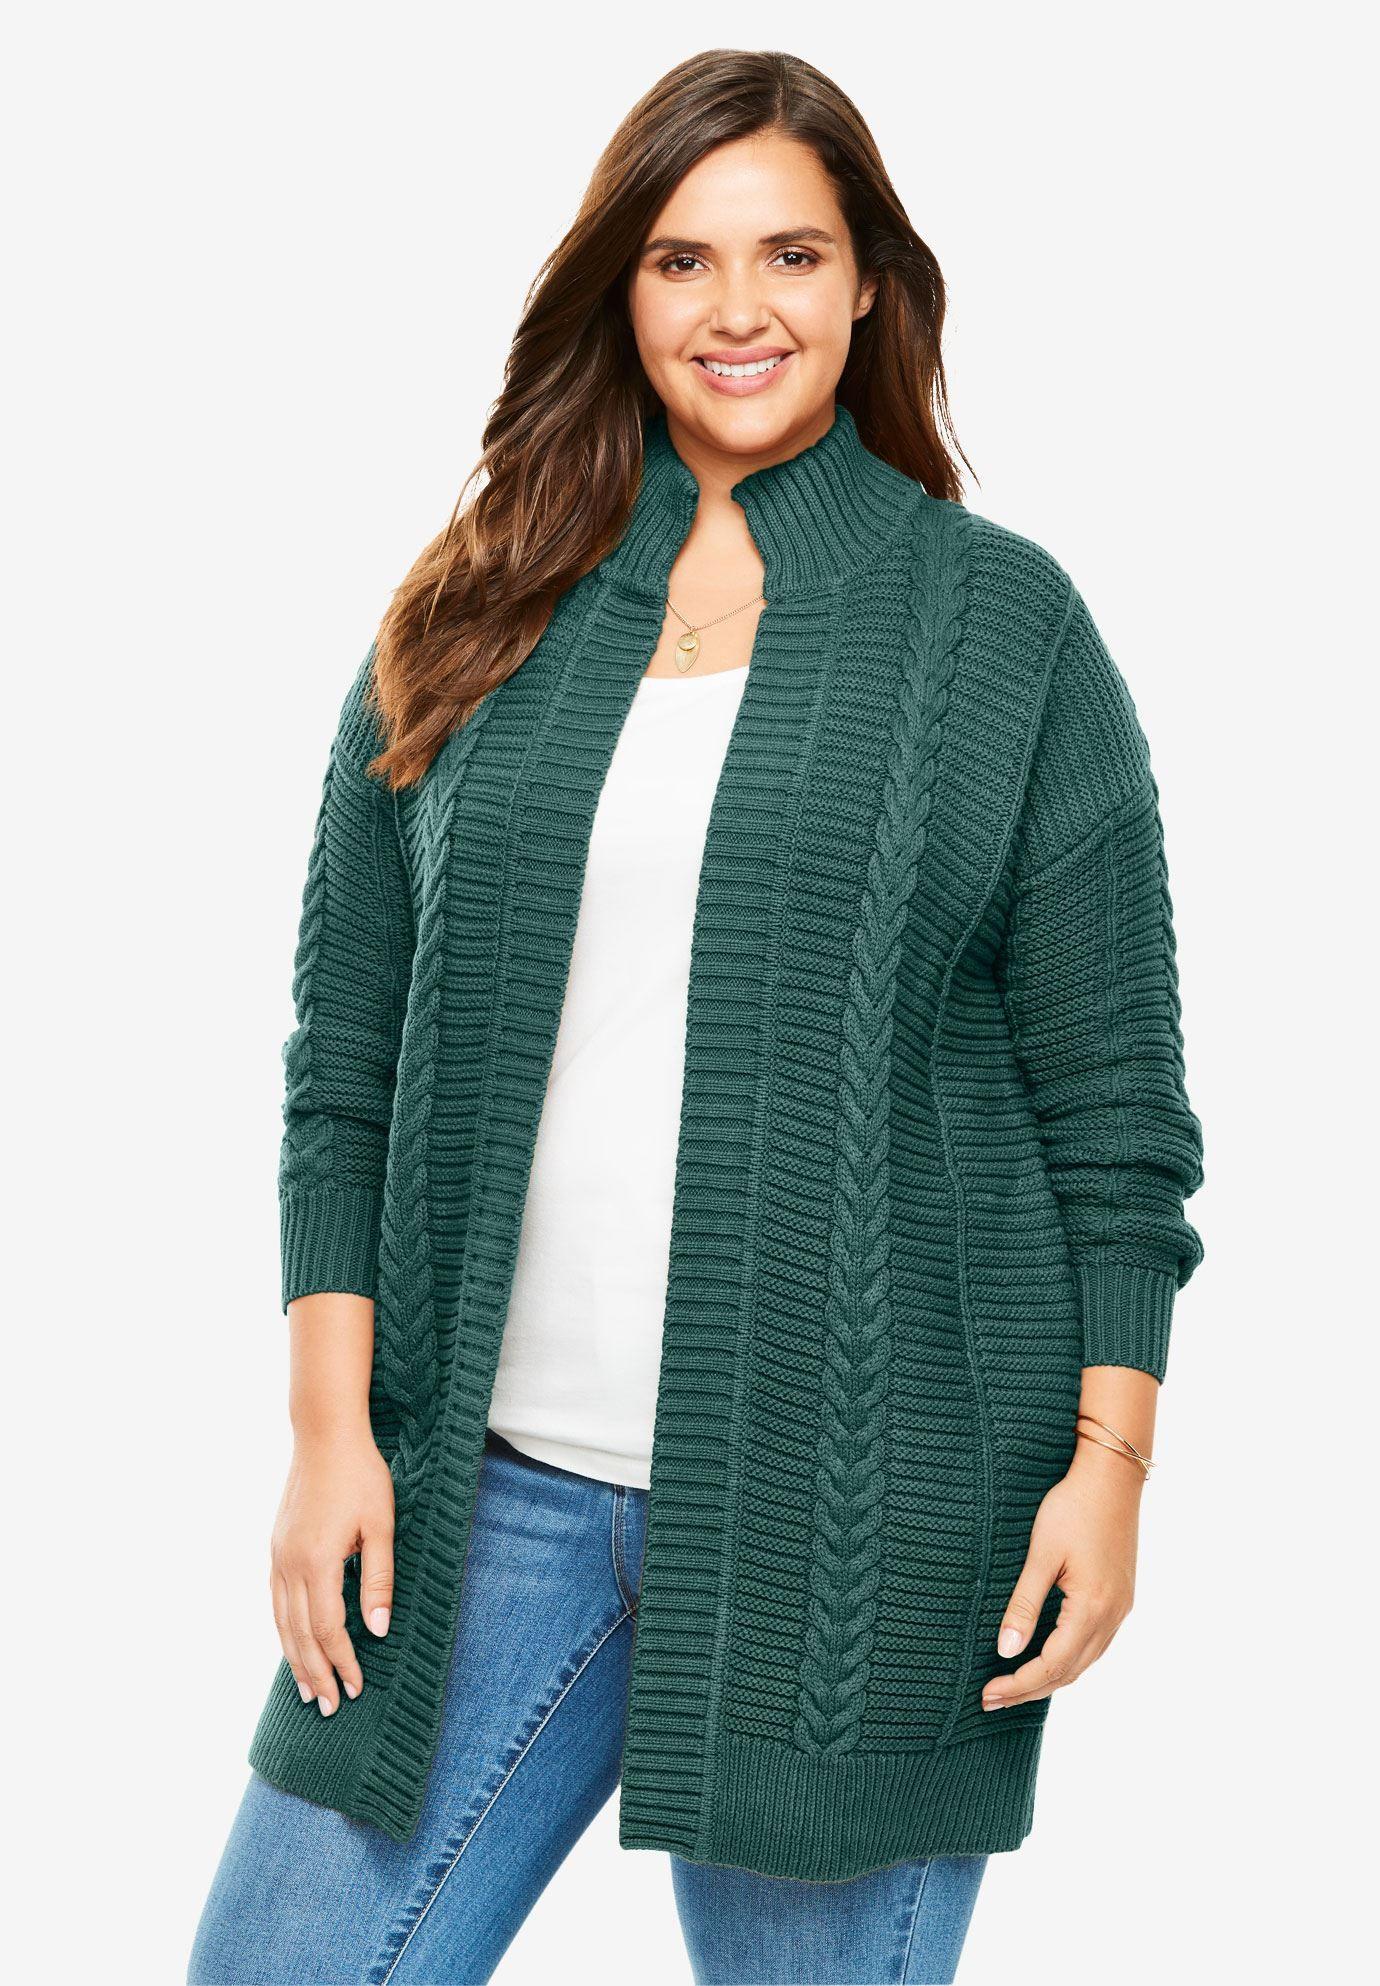 0754b6f10f5 Chunky Knit Cardigan - Women s Plus Size Clothing